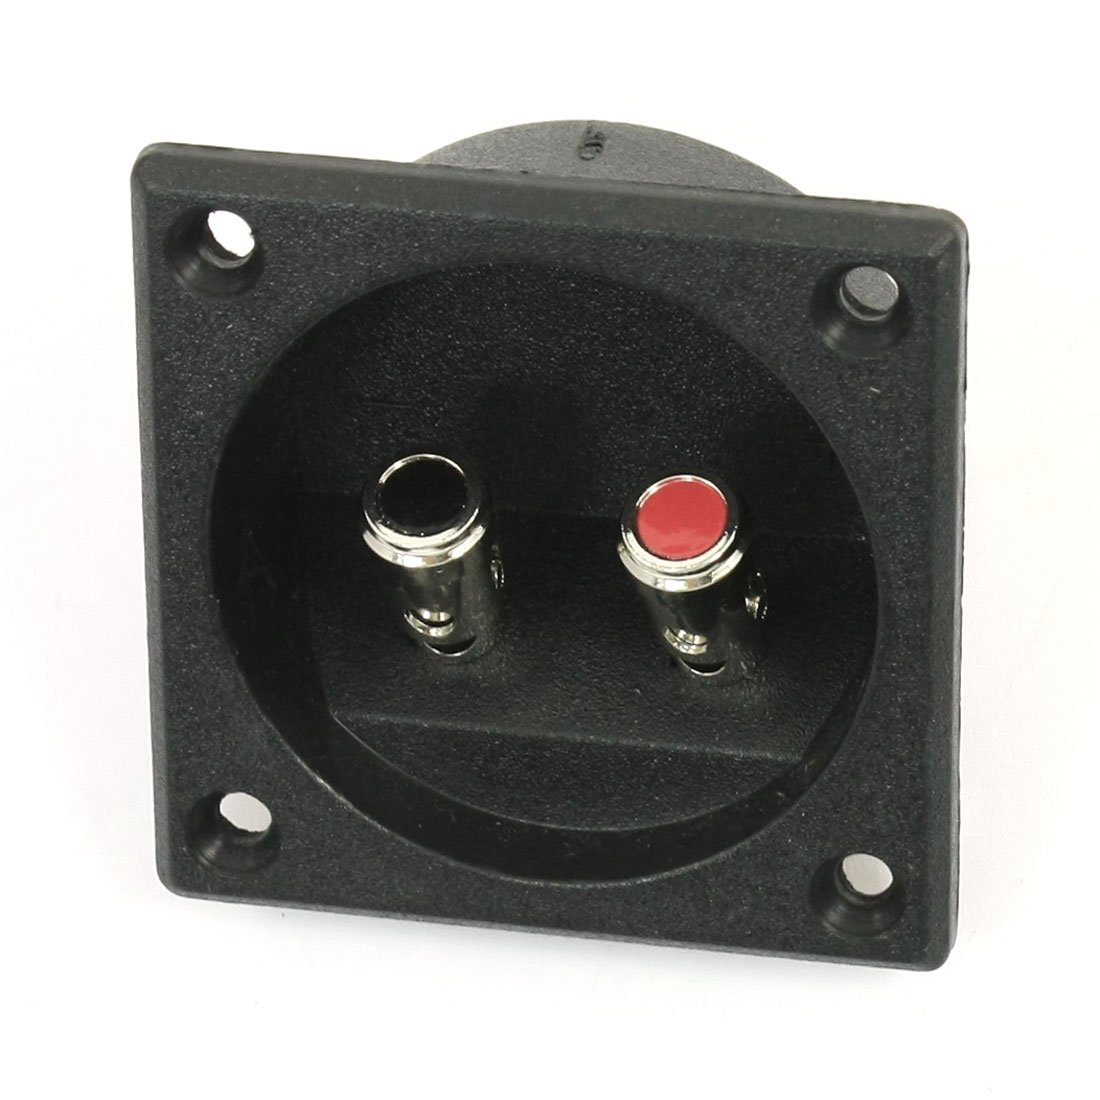 IMC Hot Square Shape Double Binding Post Type Speaker Box Terminal Cup BlackIMC Hot Square Shape Double Binding Post Type Speaker Box Terminal Cup Black